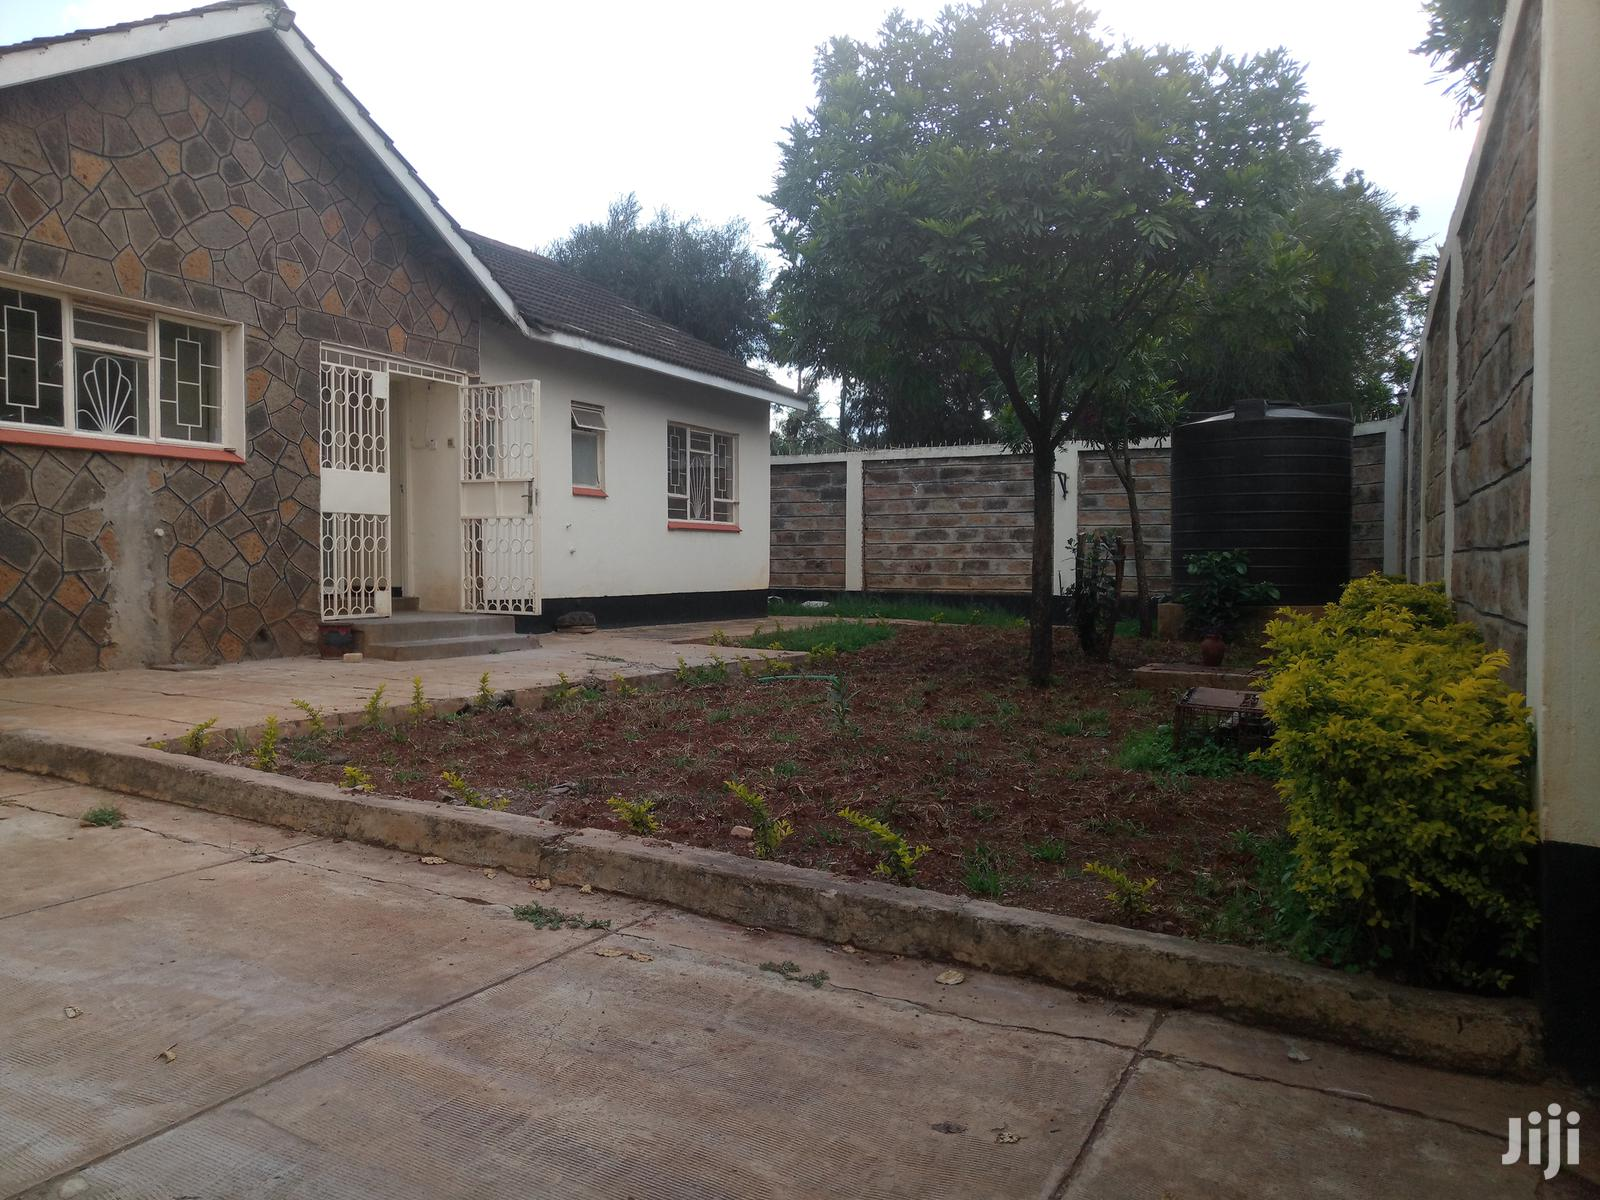 Huge 3 Bedroom Bungalow to Let Langata | Houses & Apartments For Rent for sale in Langata, Nairobi, Kenya